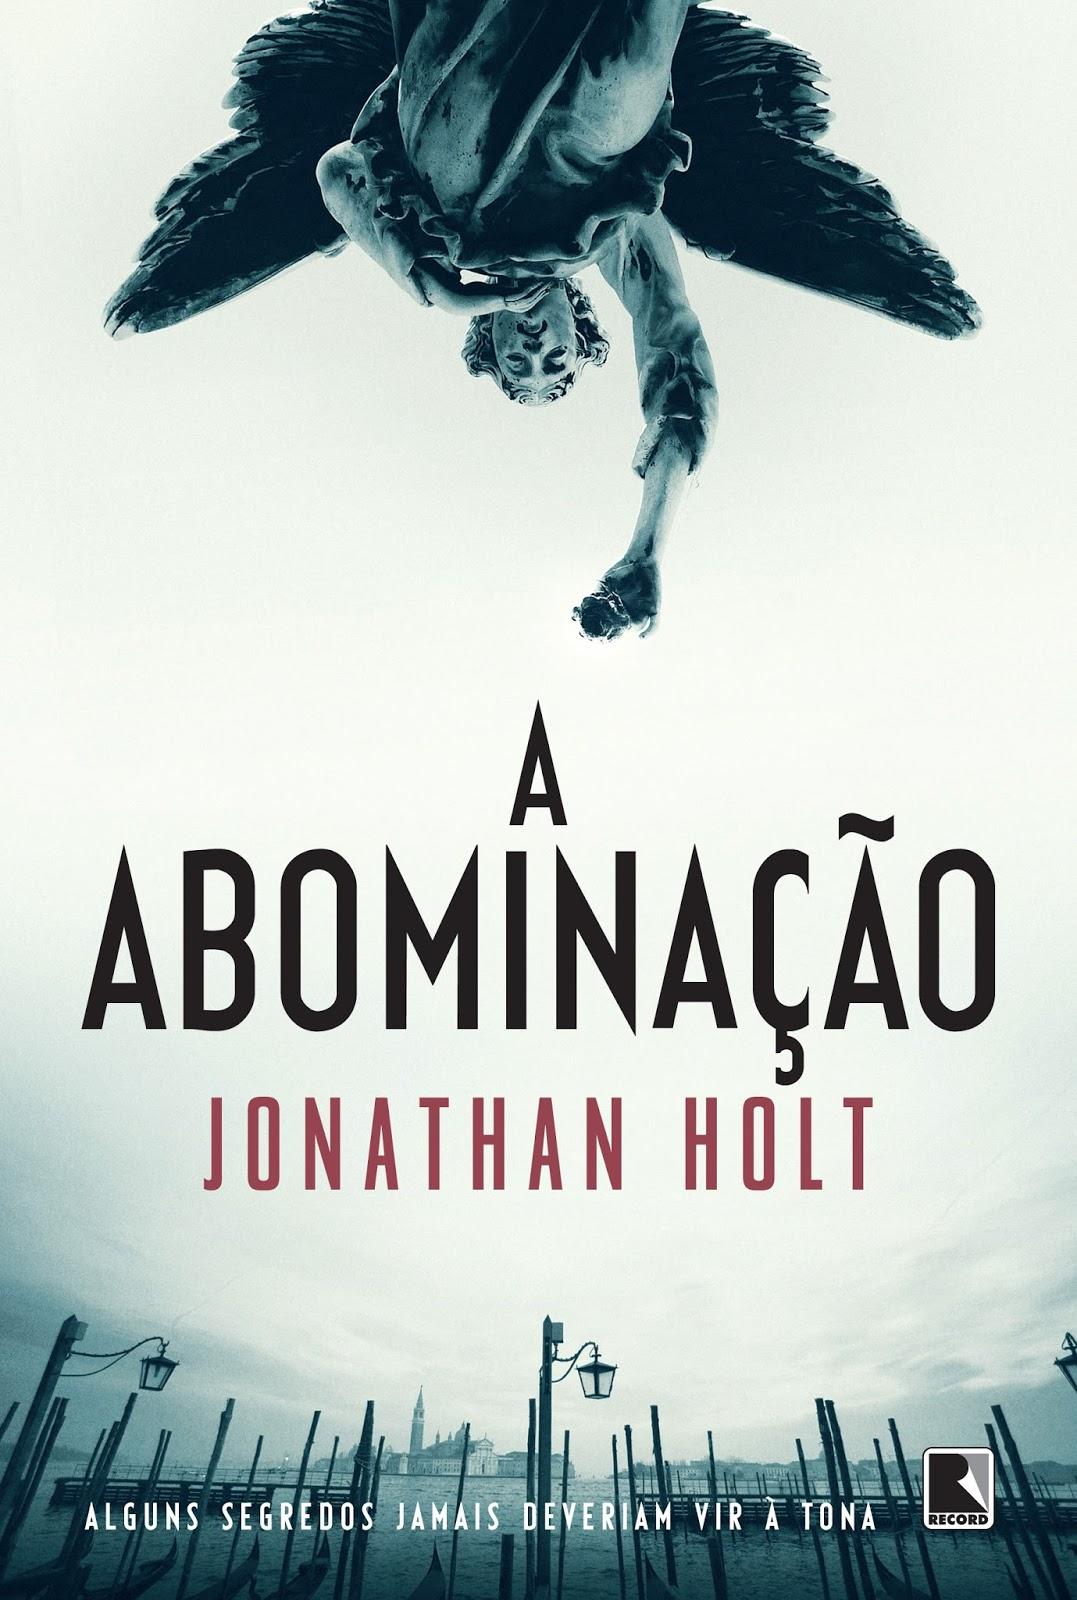 https://www.skoob.com.br/livro/380314ED430033